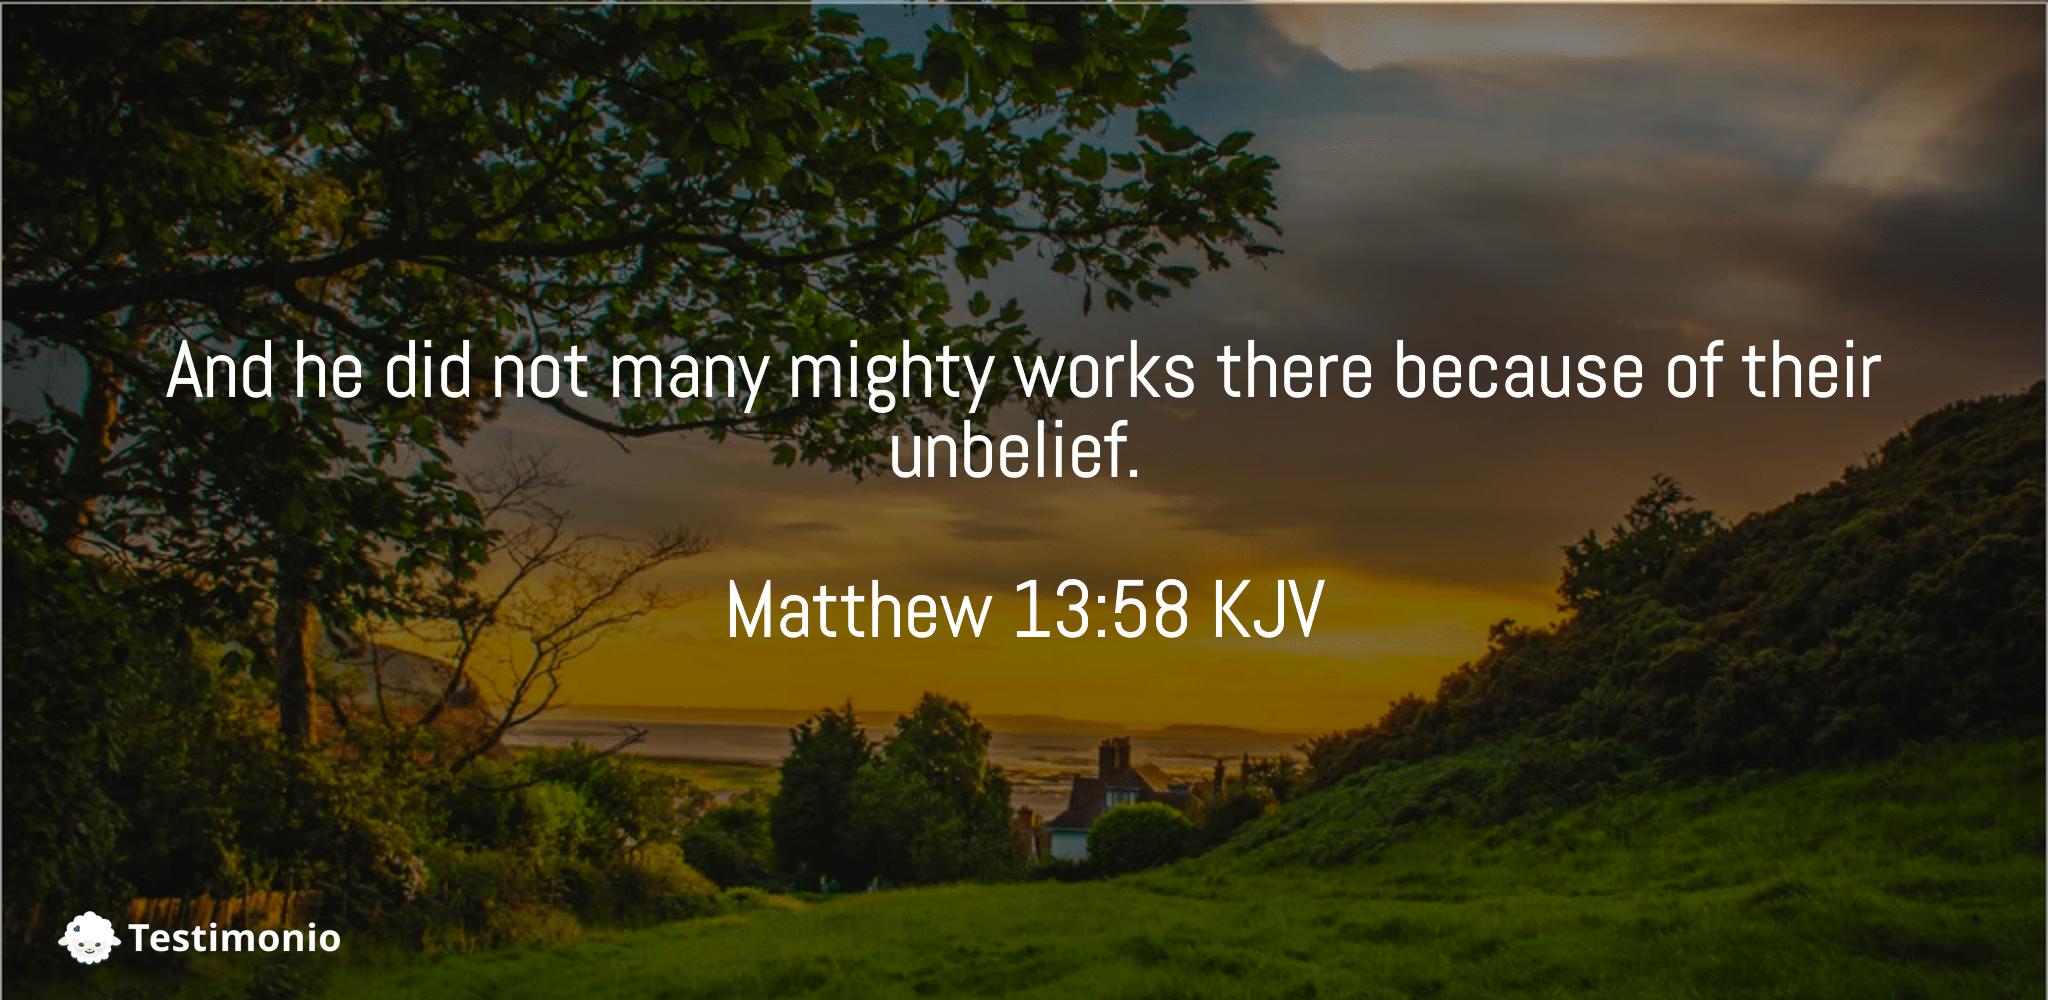 Matthew 13:58